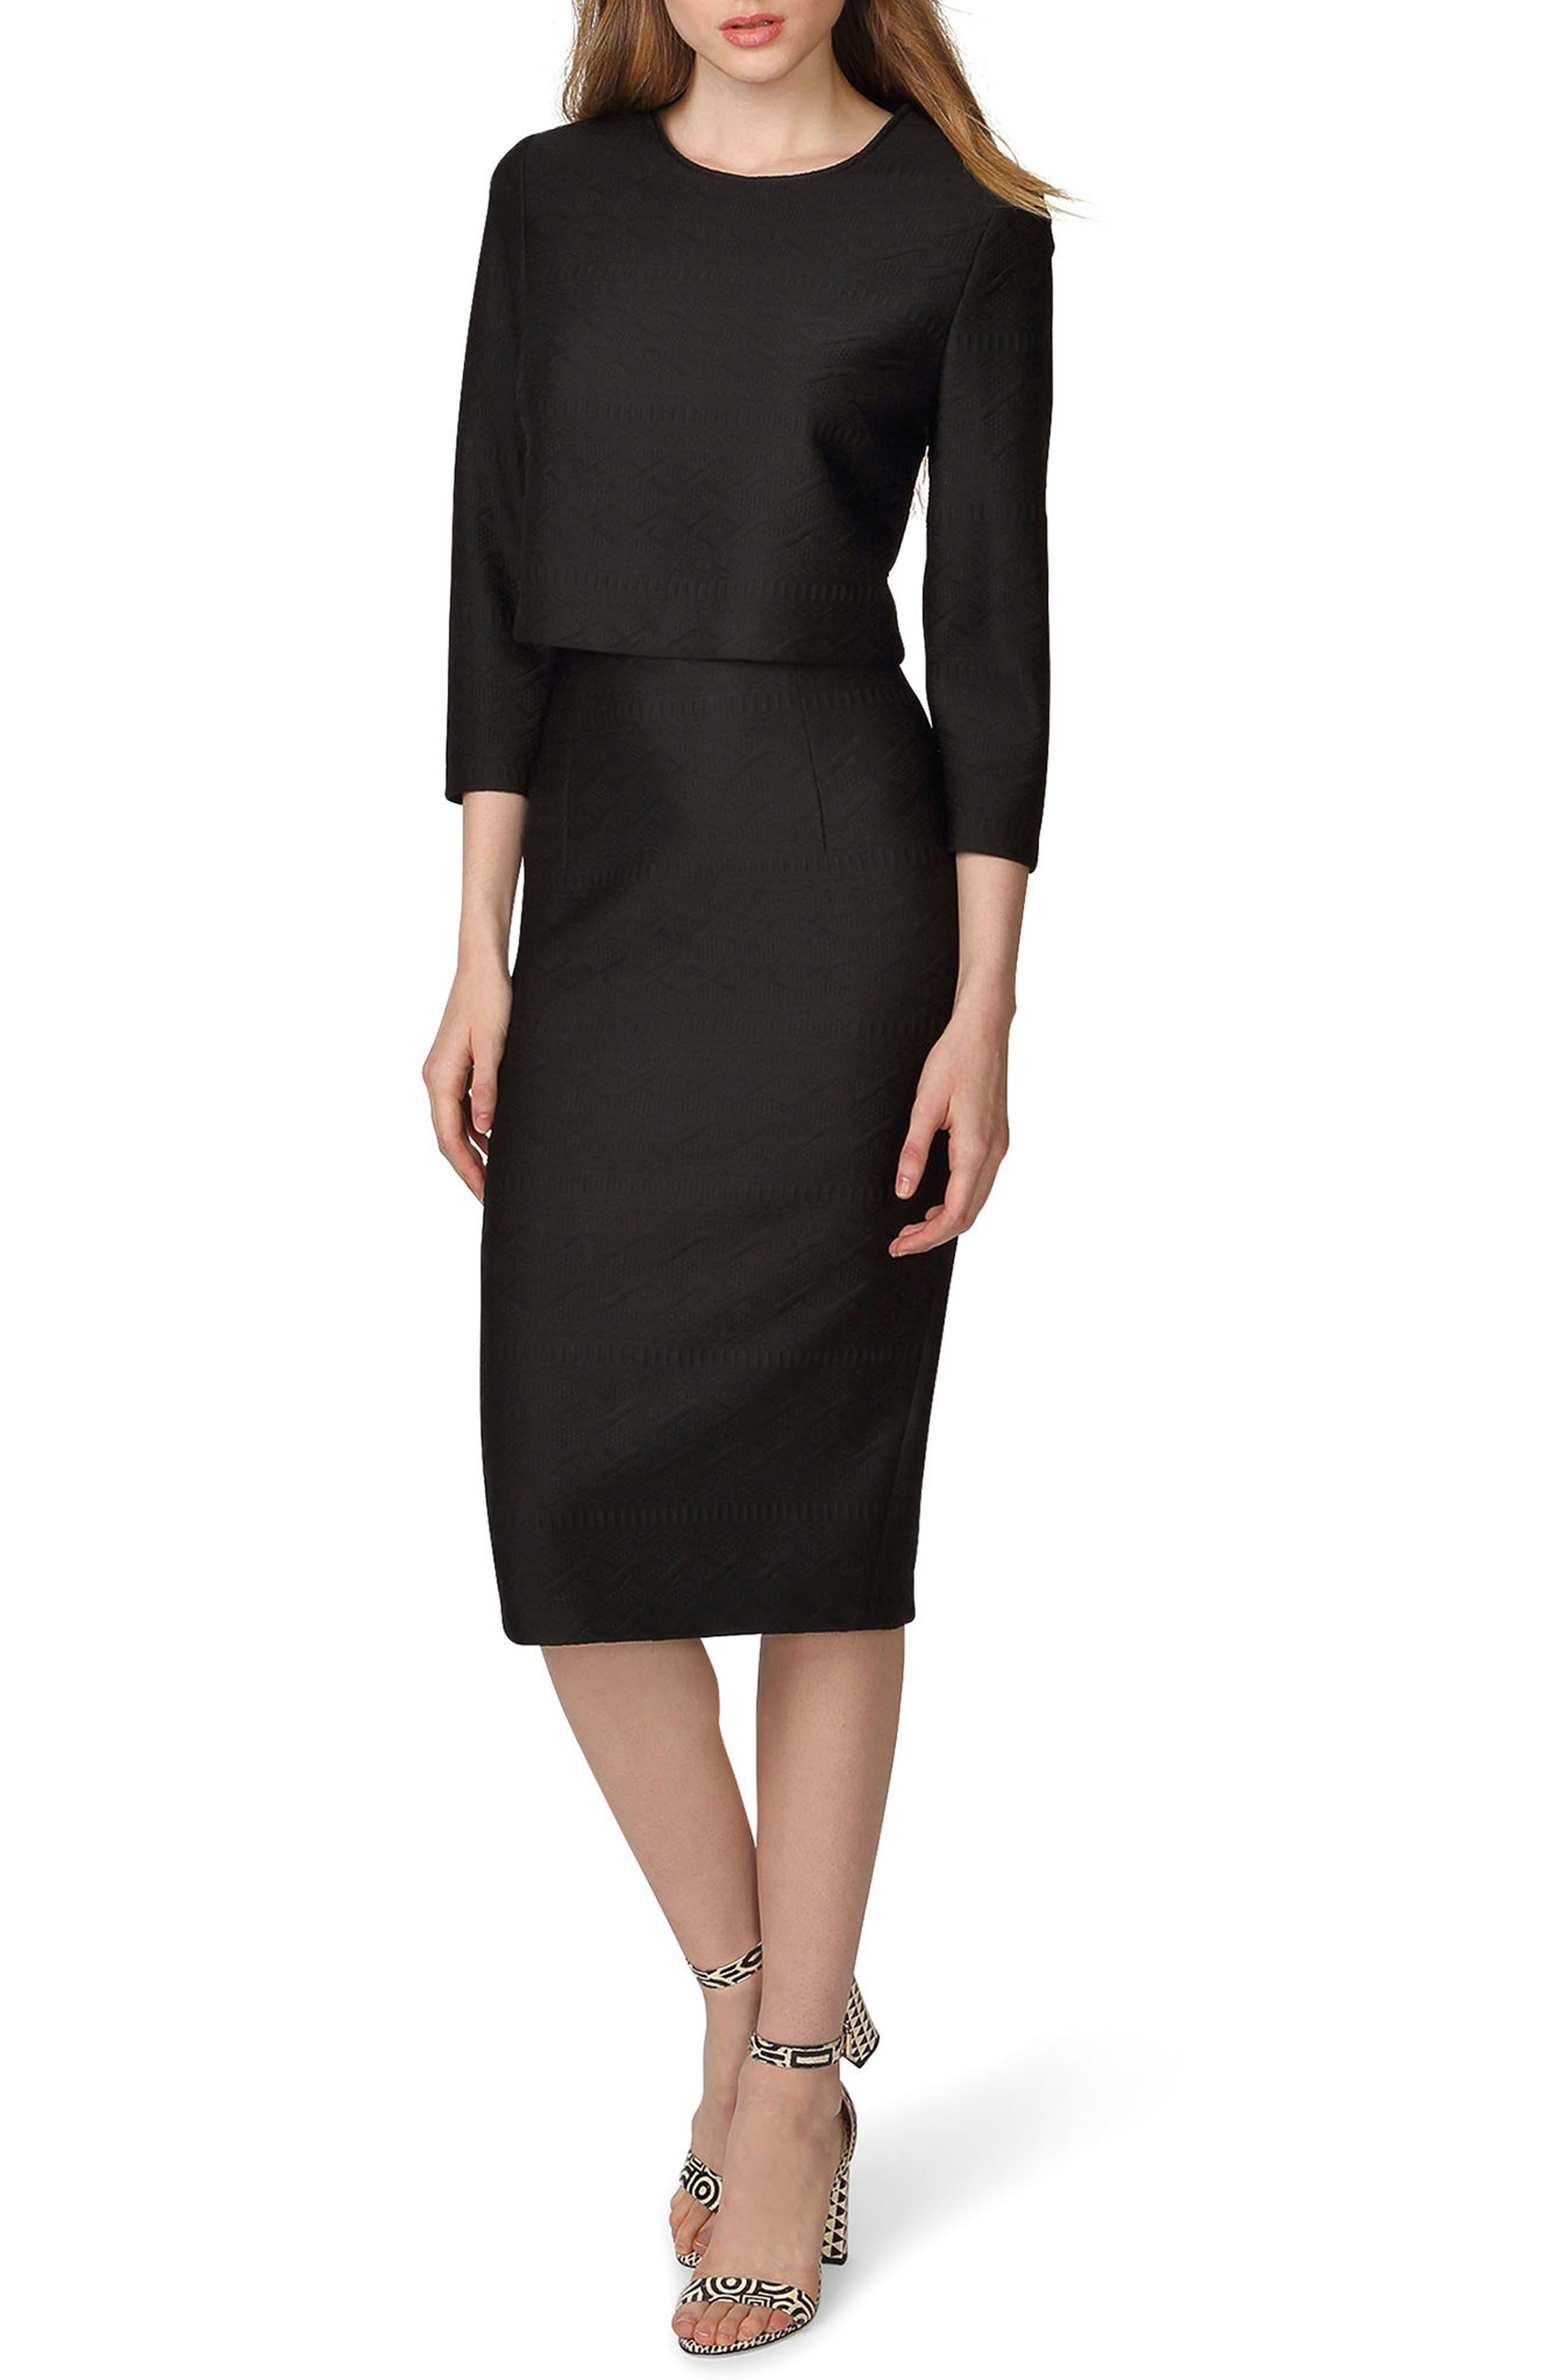 Alternate Image 1 Selected - Donna Morgan Jacquard Two-Piece Dress